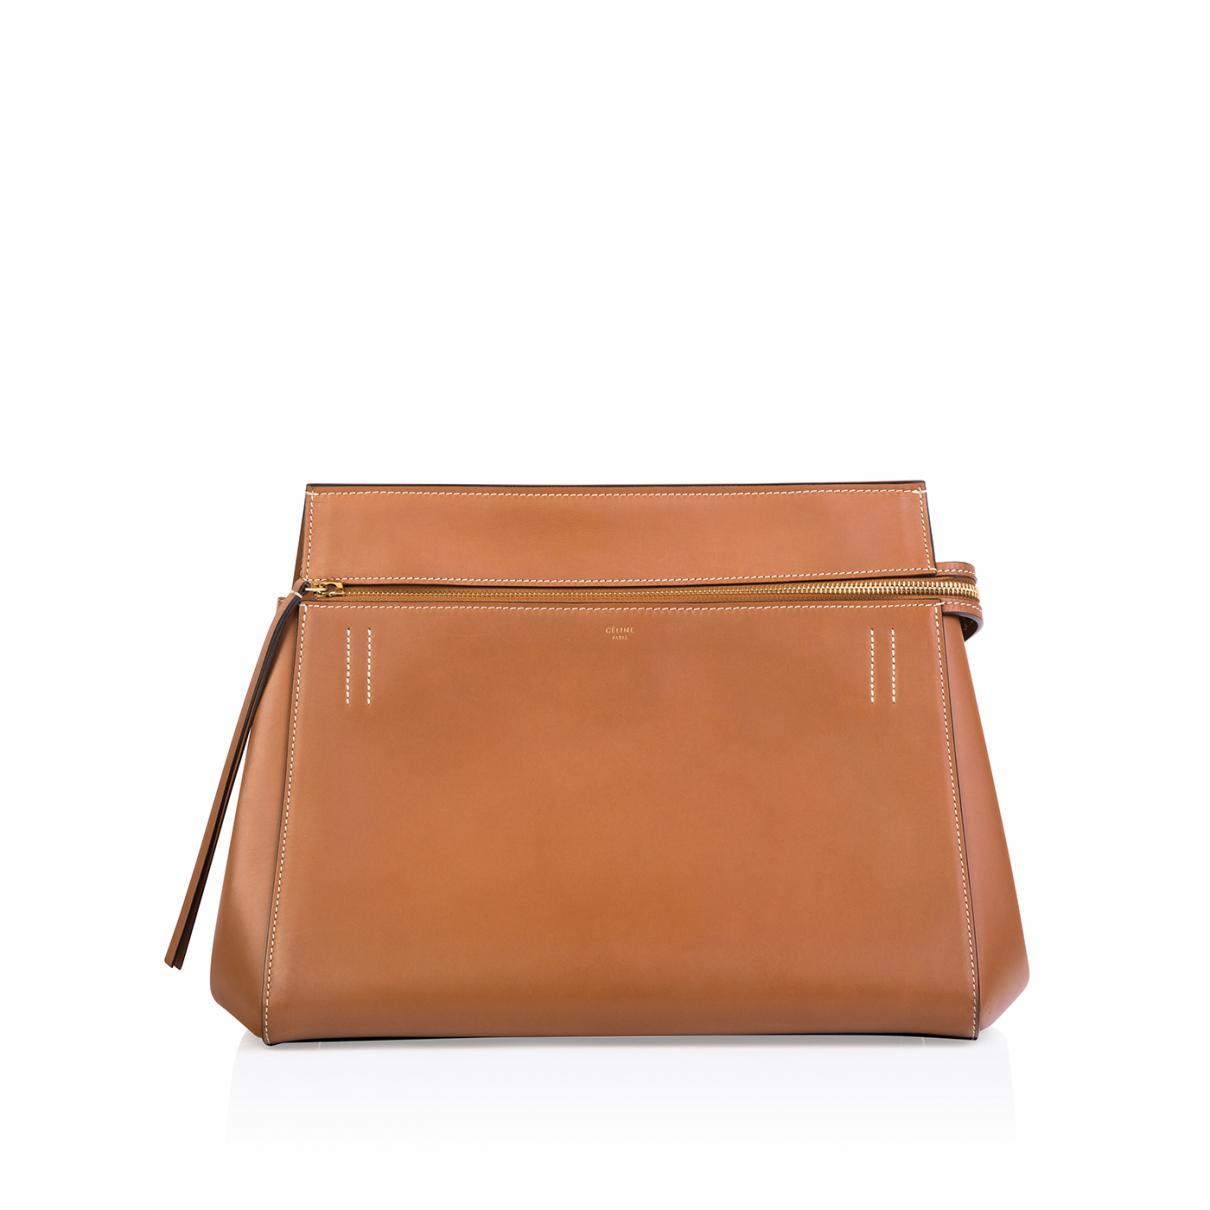 e9e61740c281 Céline Pre-owned Edge Leather Handbag in Brown - Lyst